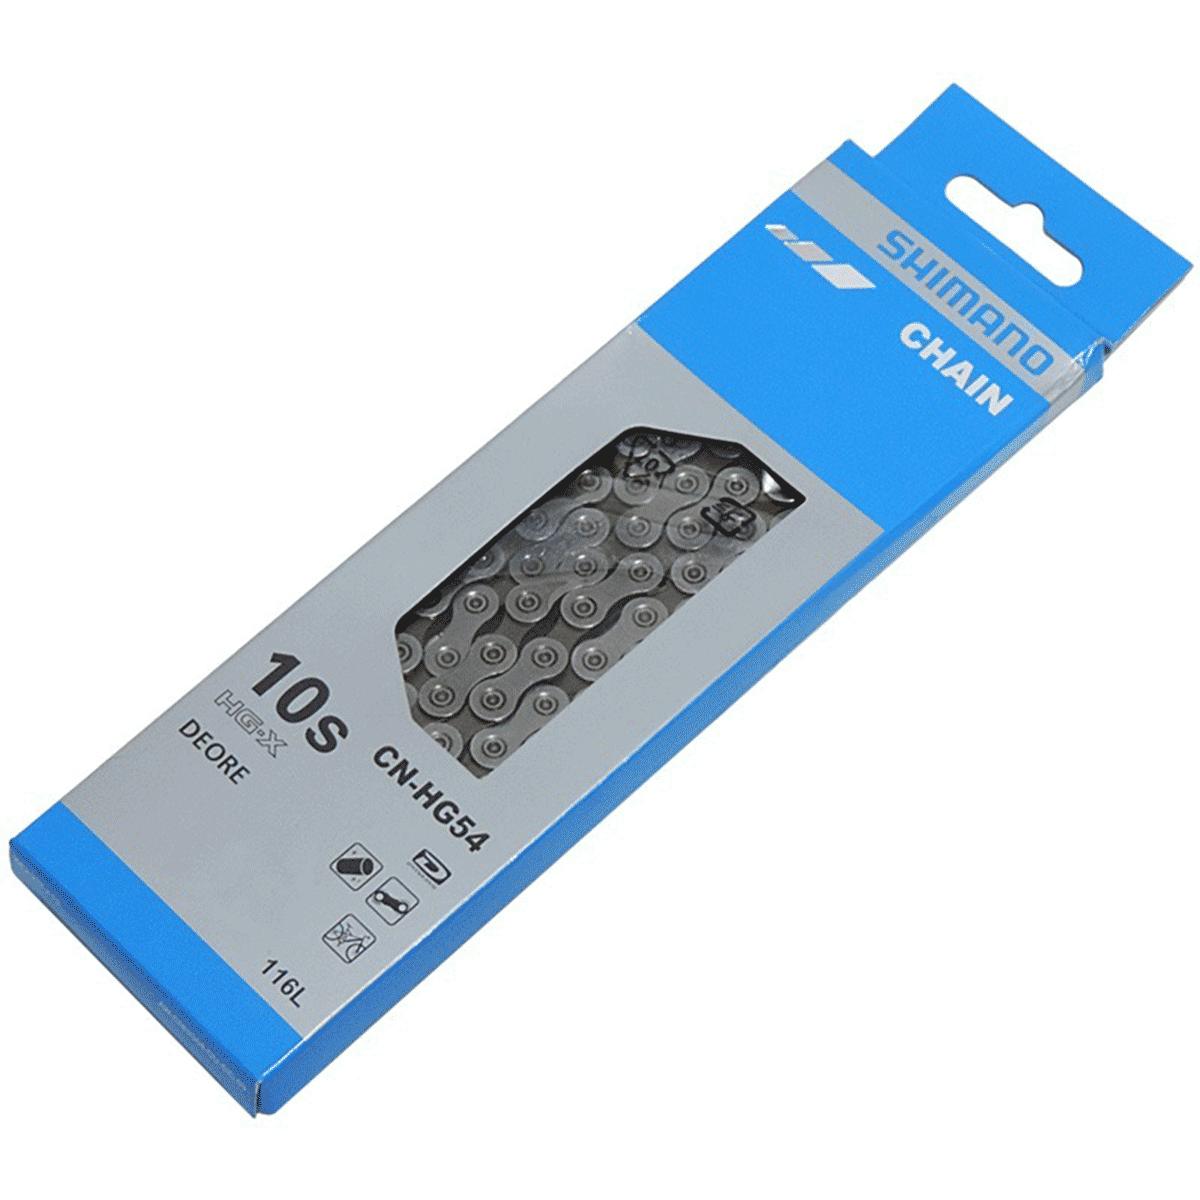 Cassete Bike Shimano Deore M4100 10v 11/42 + Corrente Shimano 10v